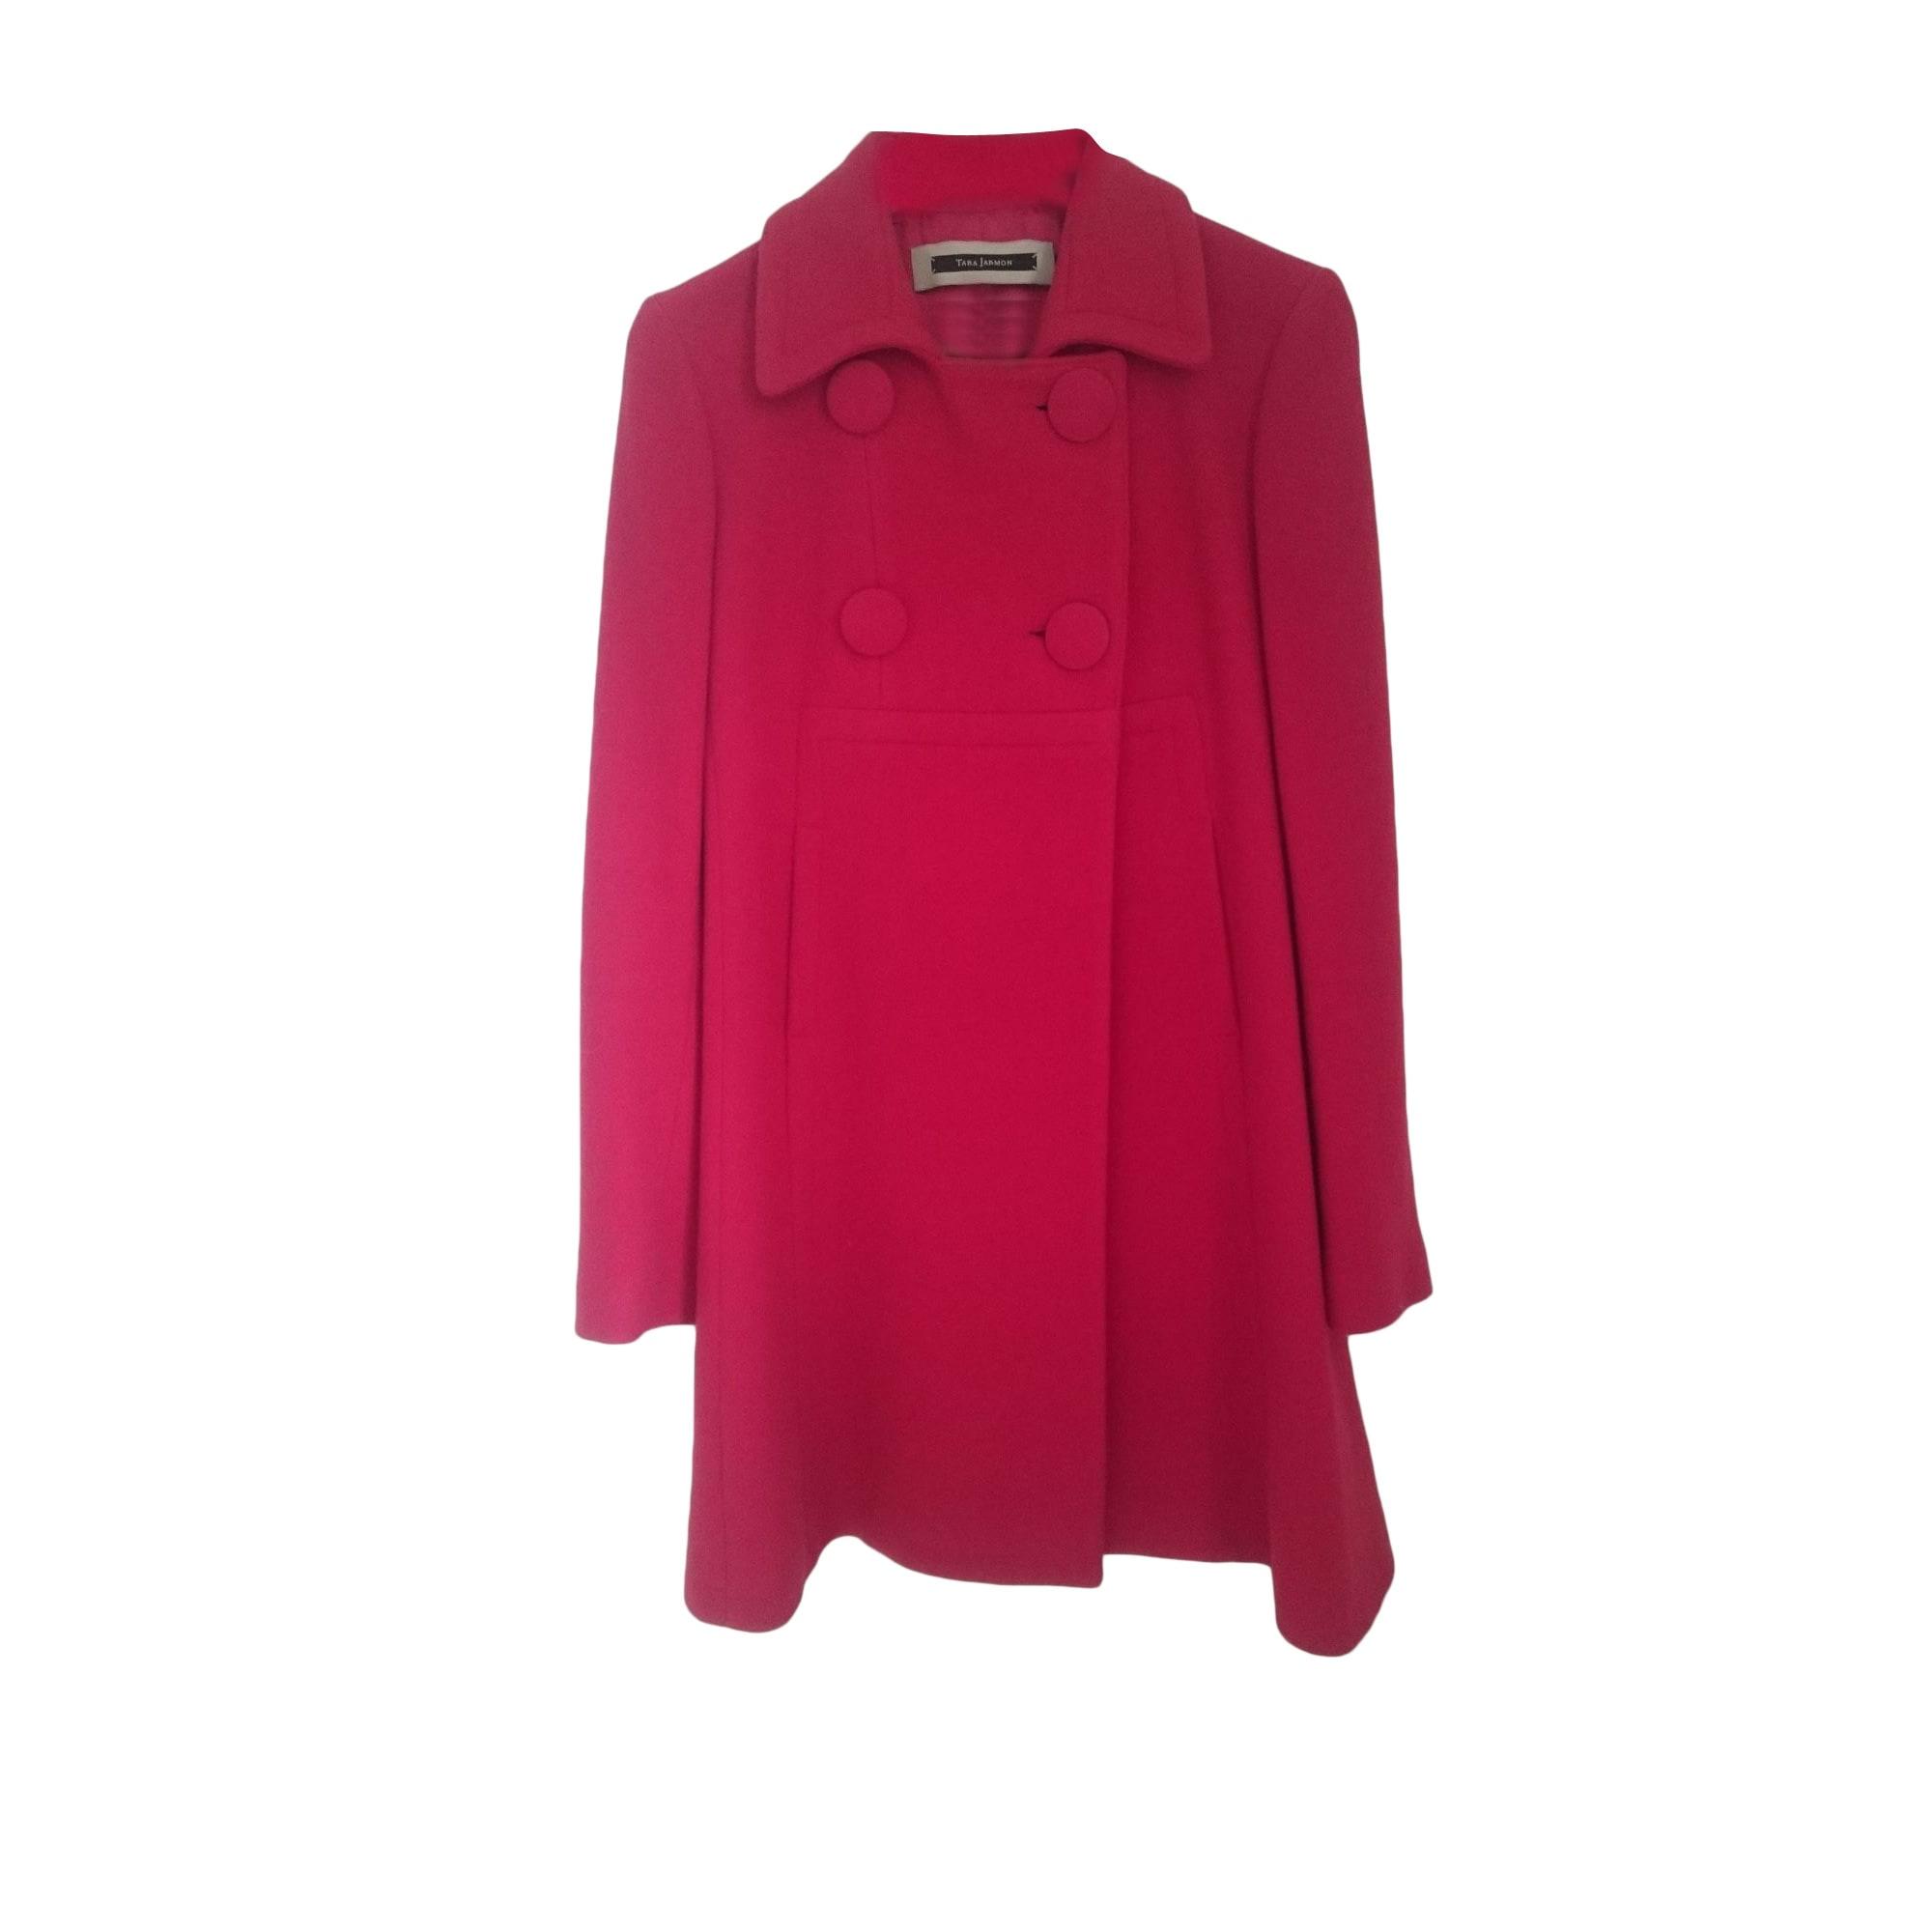 Manteau TARA JARMON 40 (L, T3) rouge vendu par Laura129732 - 8030580 302949291db6